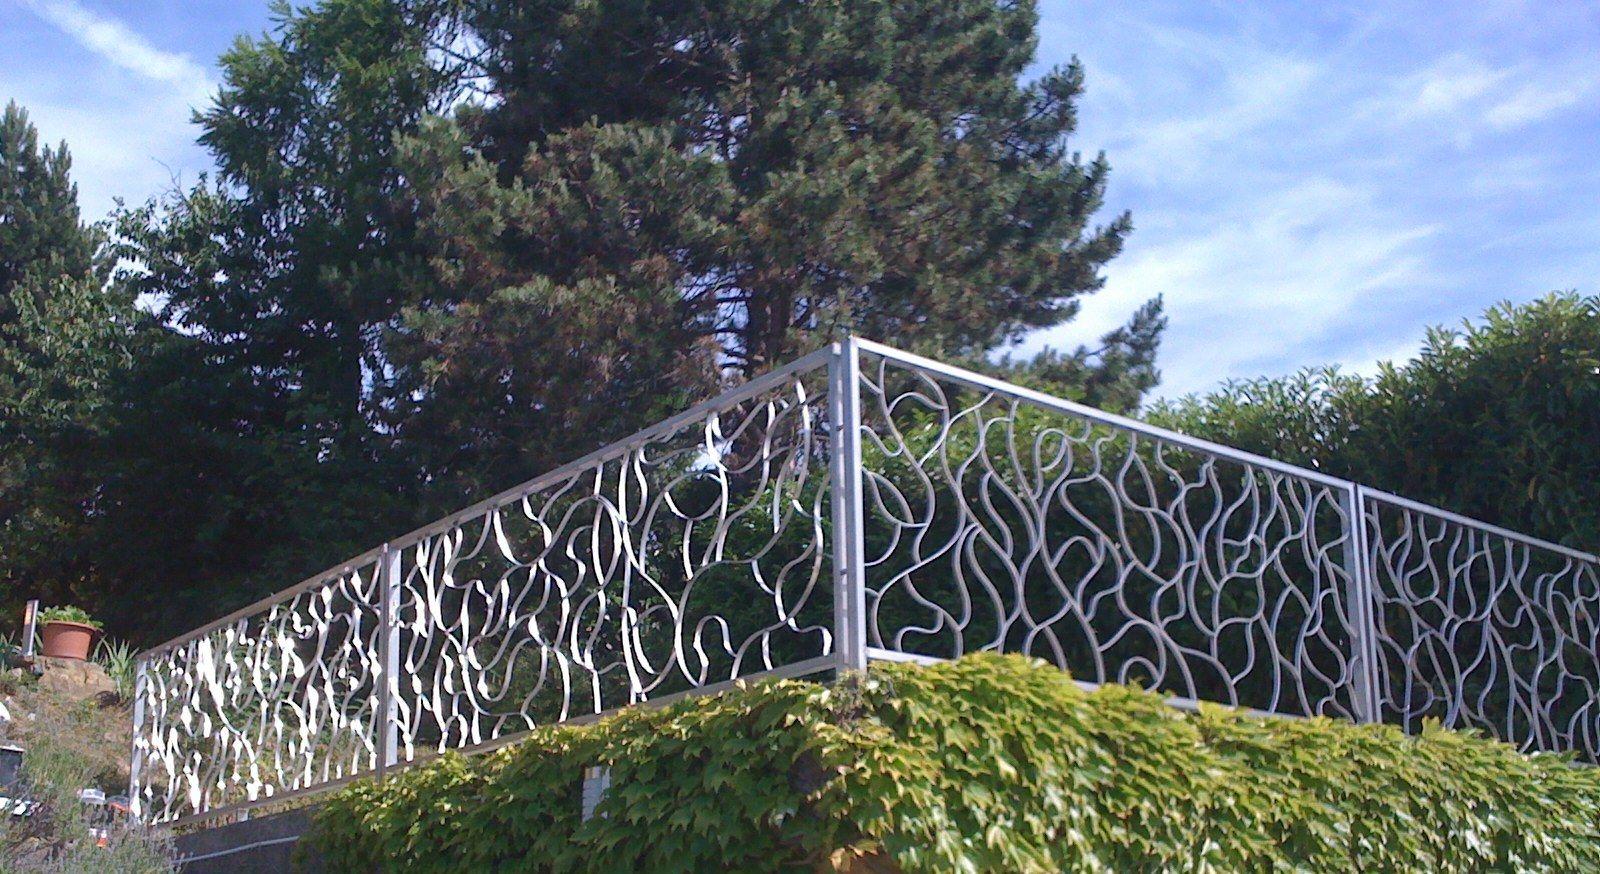 Design : Cloture De Jardin Castorama   Lyon 11, Cloture Pvc Gris  Anthracite, Cloture